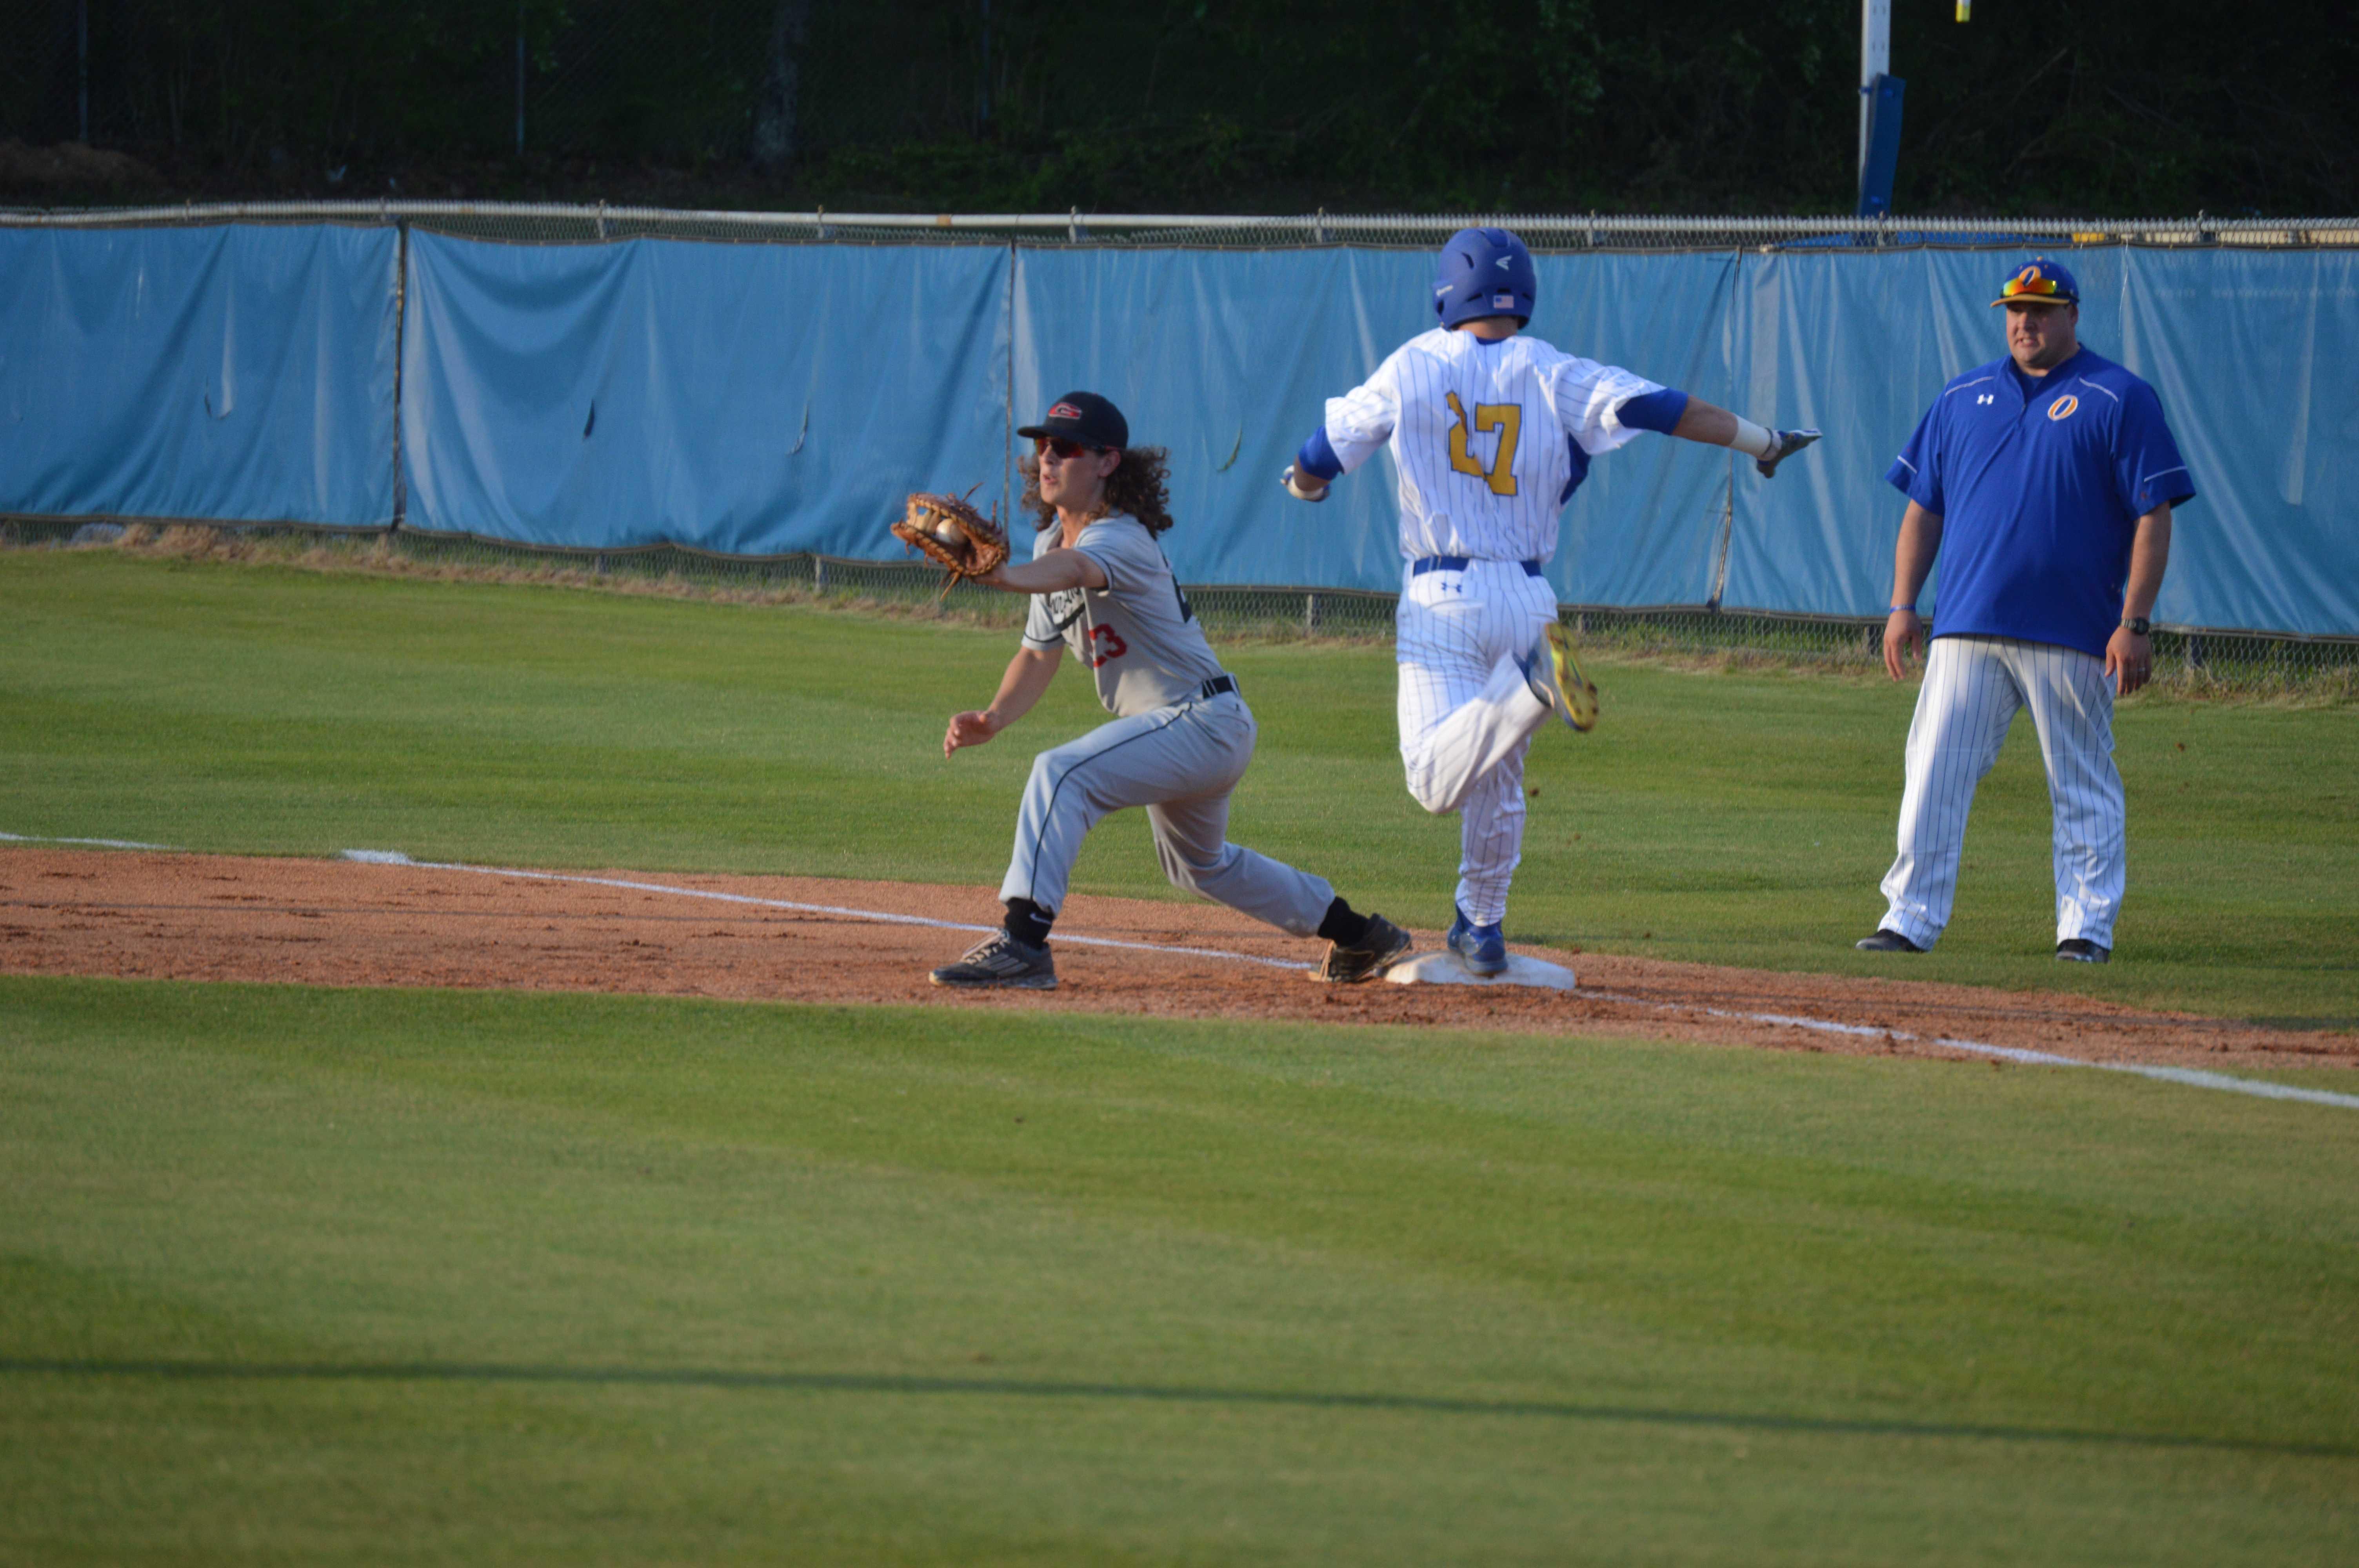 Freshman Drew Bianco hustles to first